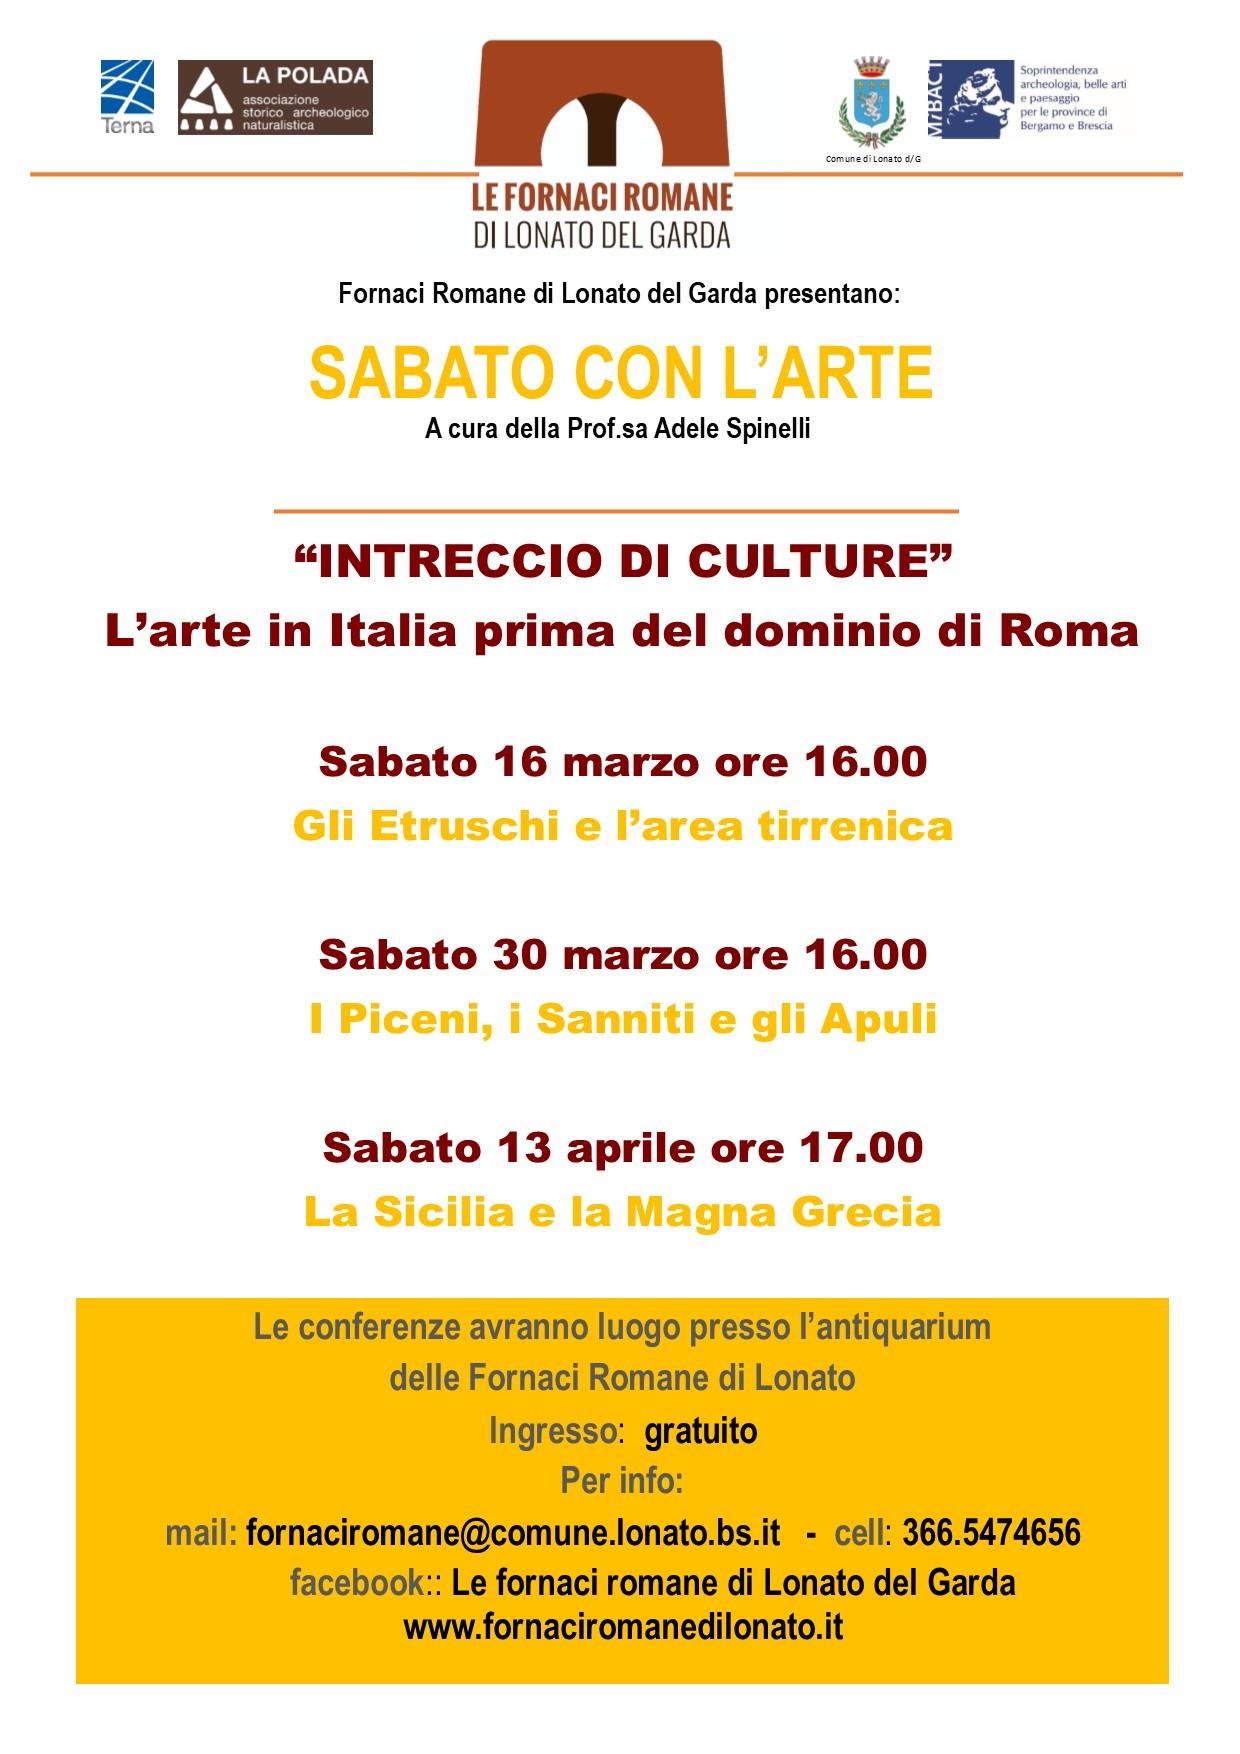 http://www.fornaciromanedilonato.it/public/UserFiles/Image/Fornaci/sabato/sabati_d_arte.jpg